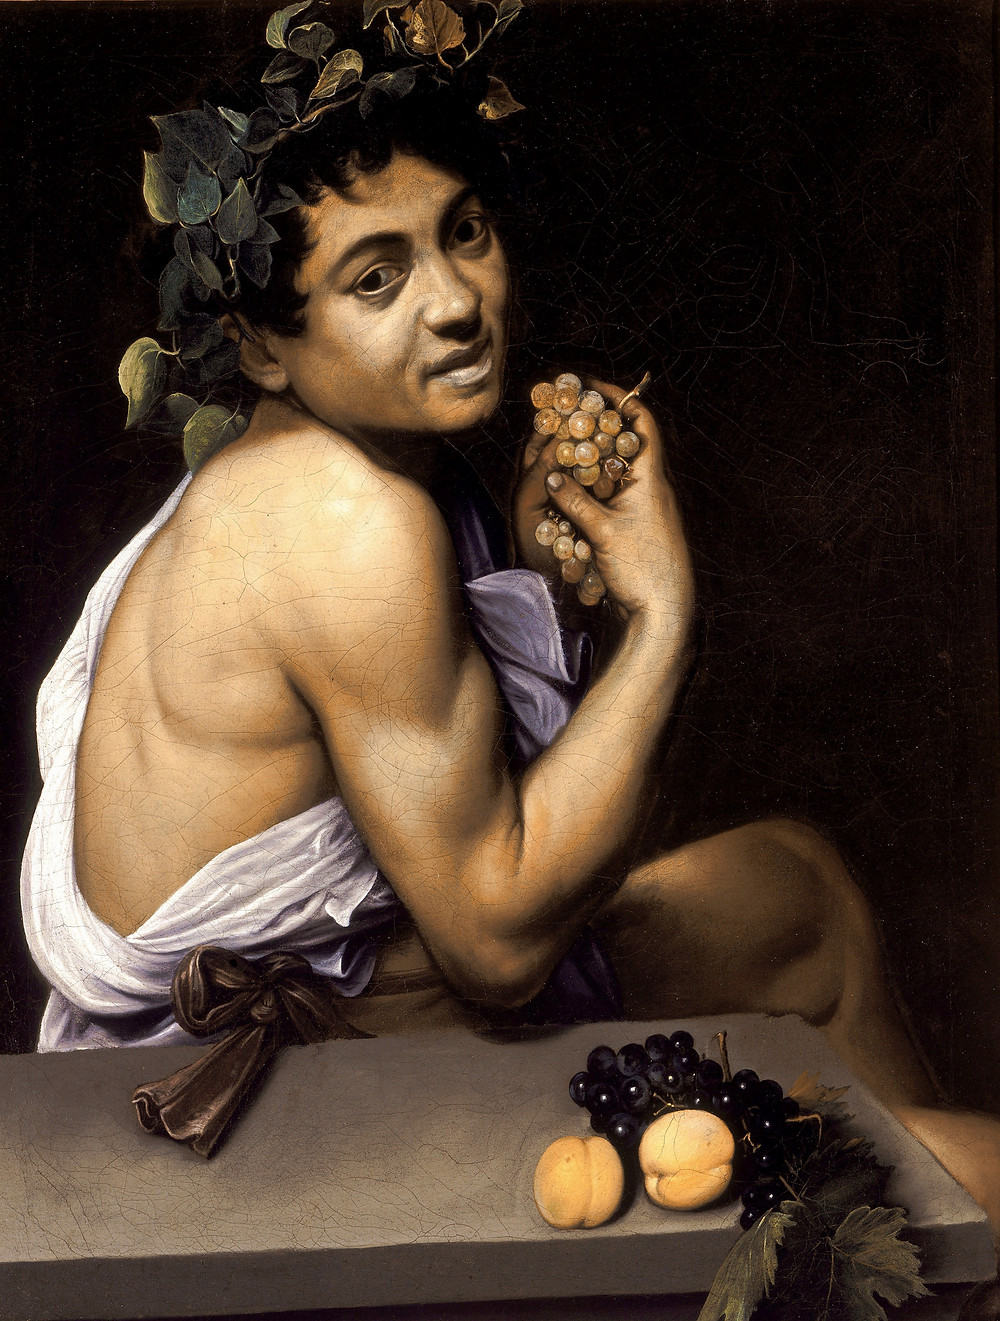 Caravaggio, Young Sick Bacchus, 1593-94